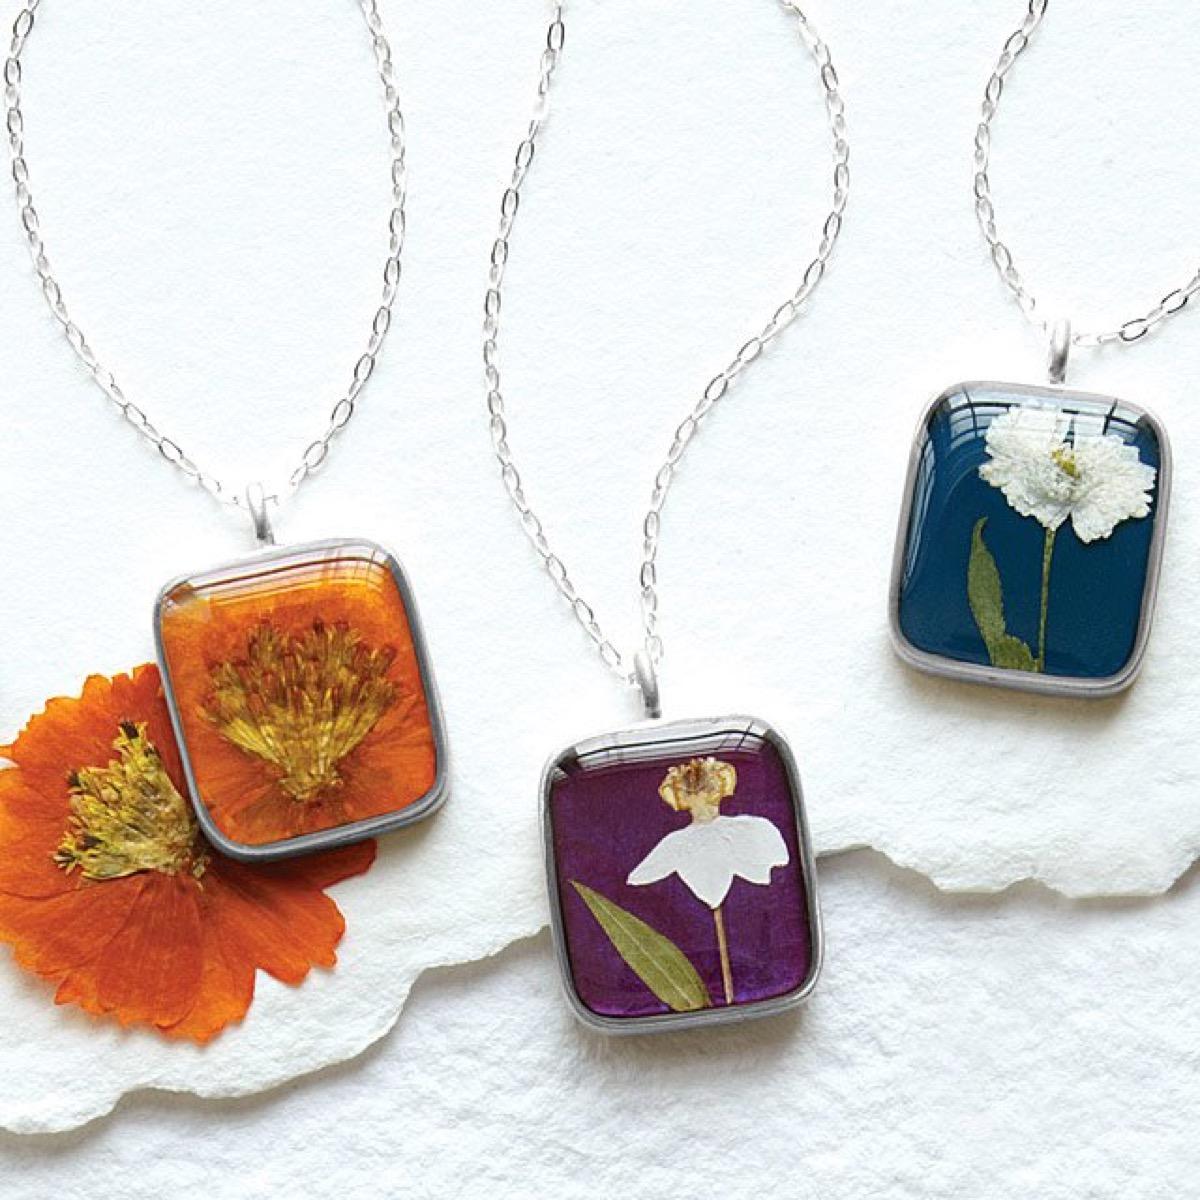 pressed flower necklace, best friend gifts